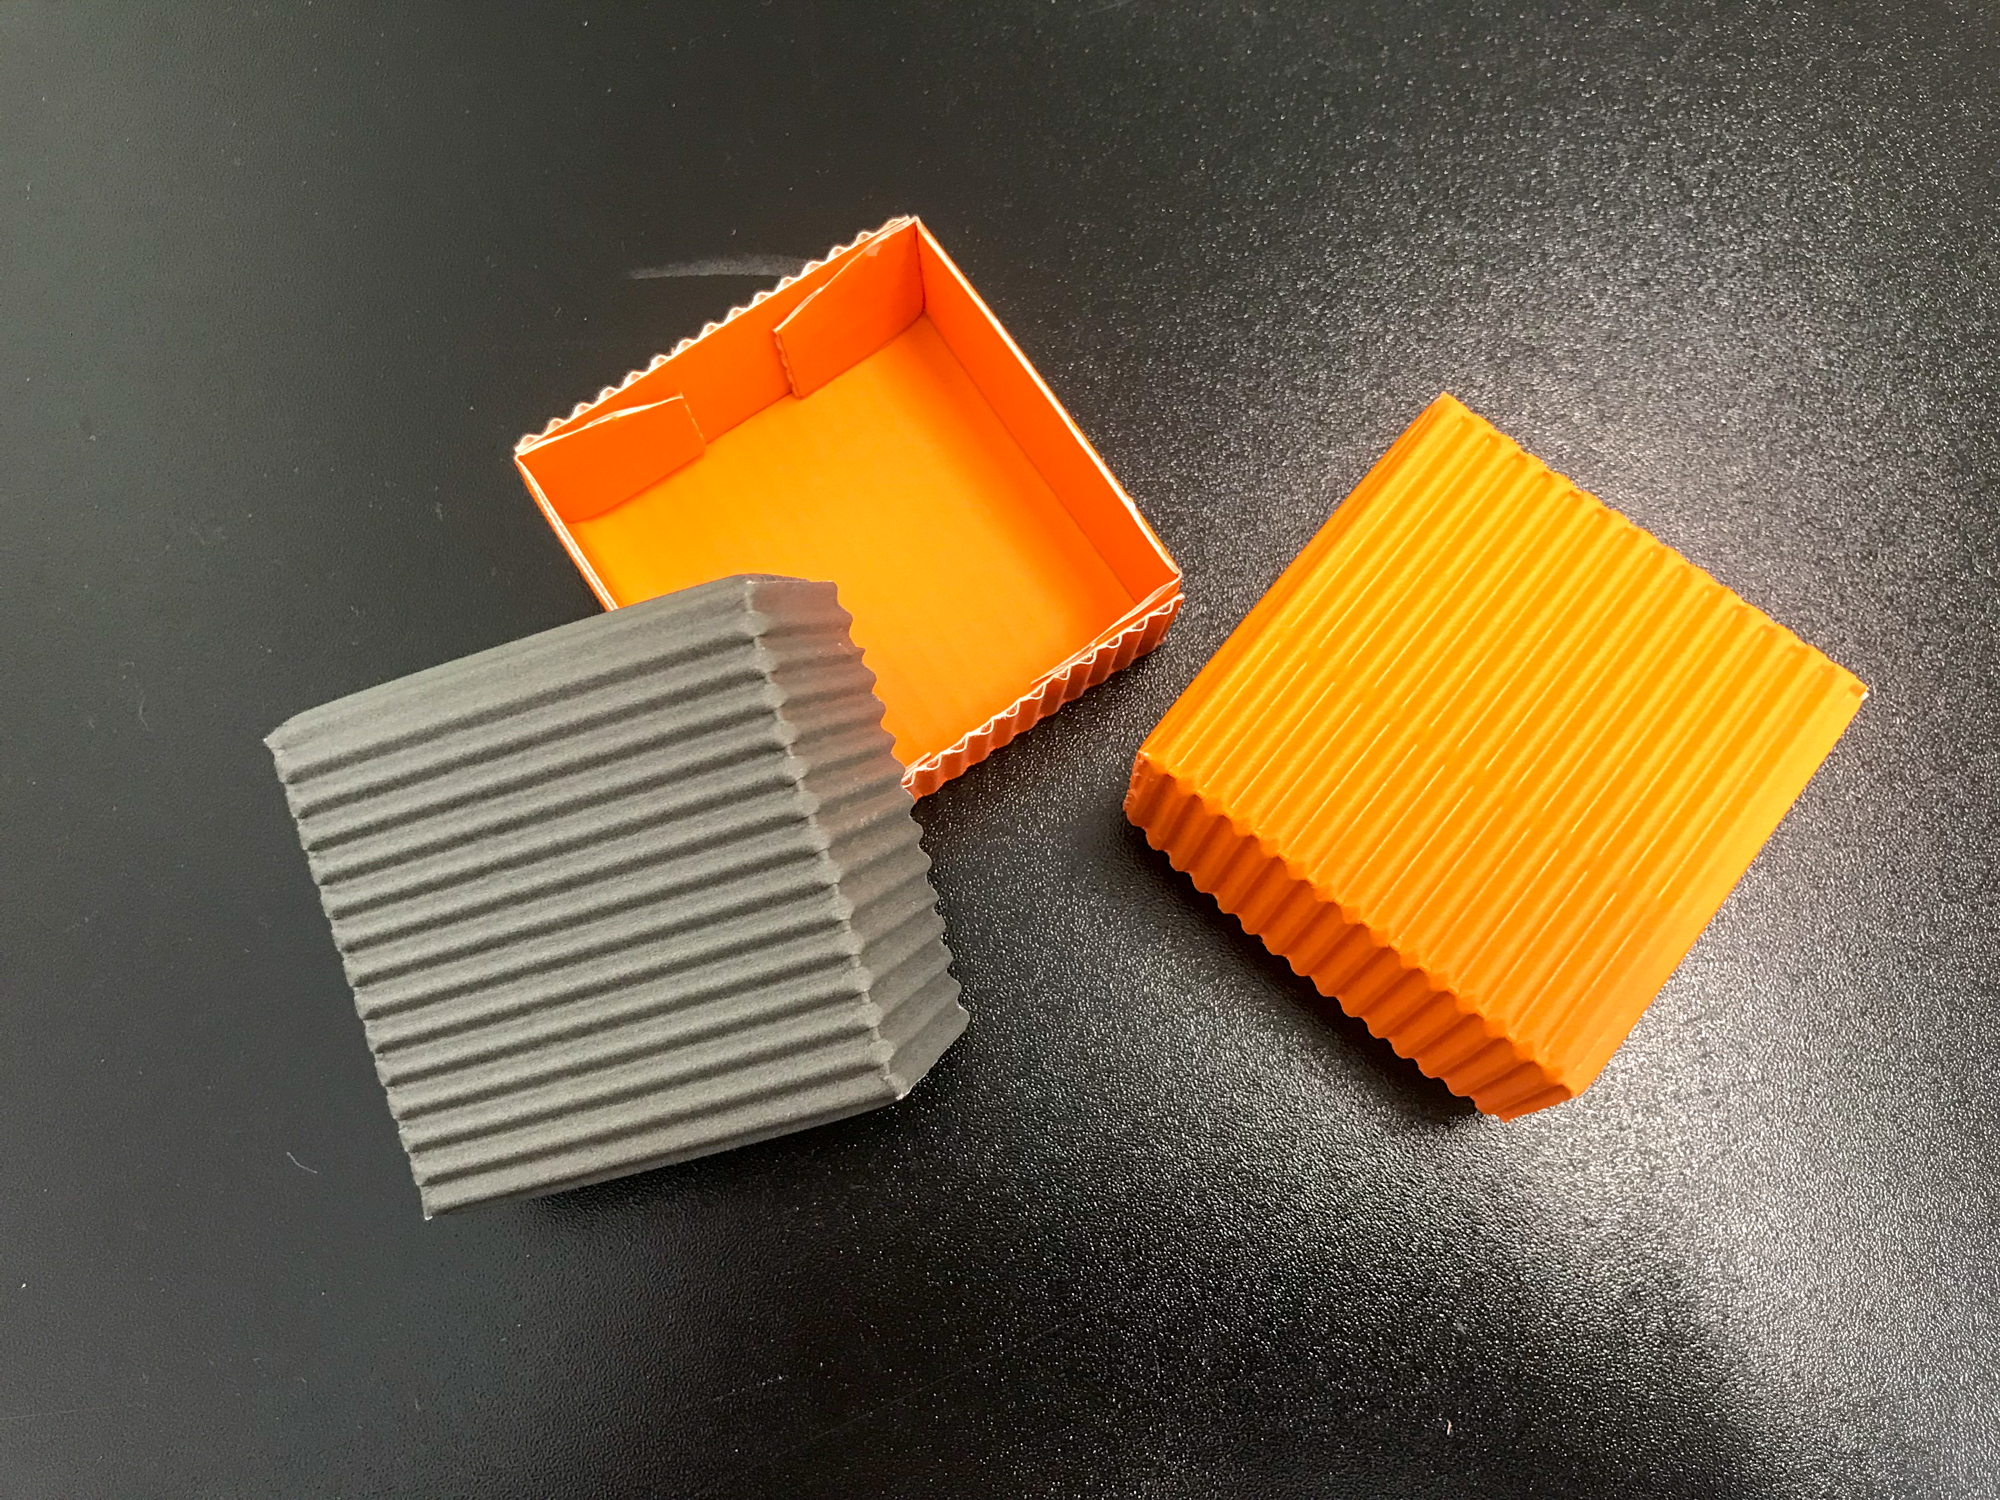 Handgefertigte Verpackung (c)decoDesign-peters